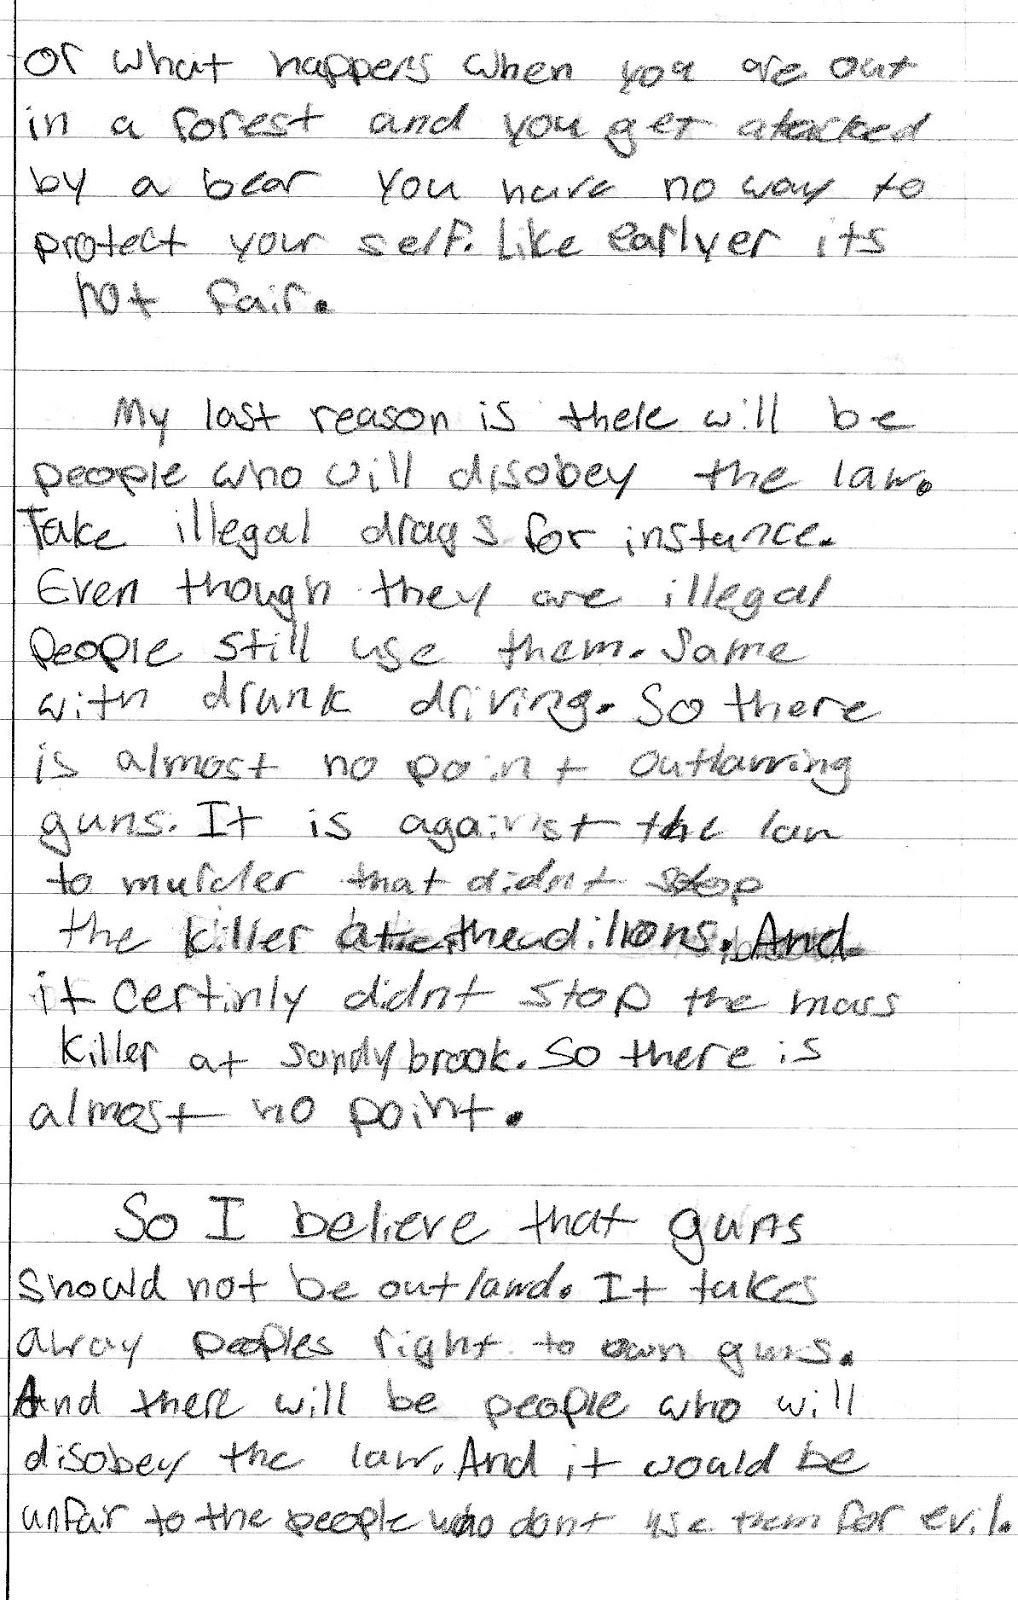 gun control essay gun control essay hook anti war essays anti war  outline for argumentative essay on gun control effets extrapatrimoniaux du mariage dissertation alexstojda tk effets extrapatrimoniaux